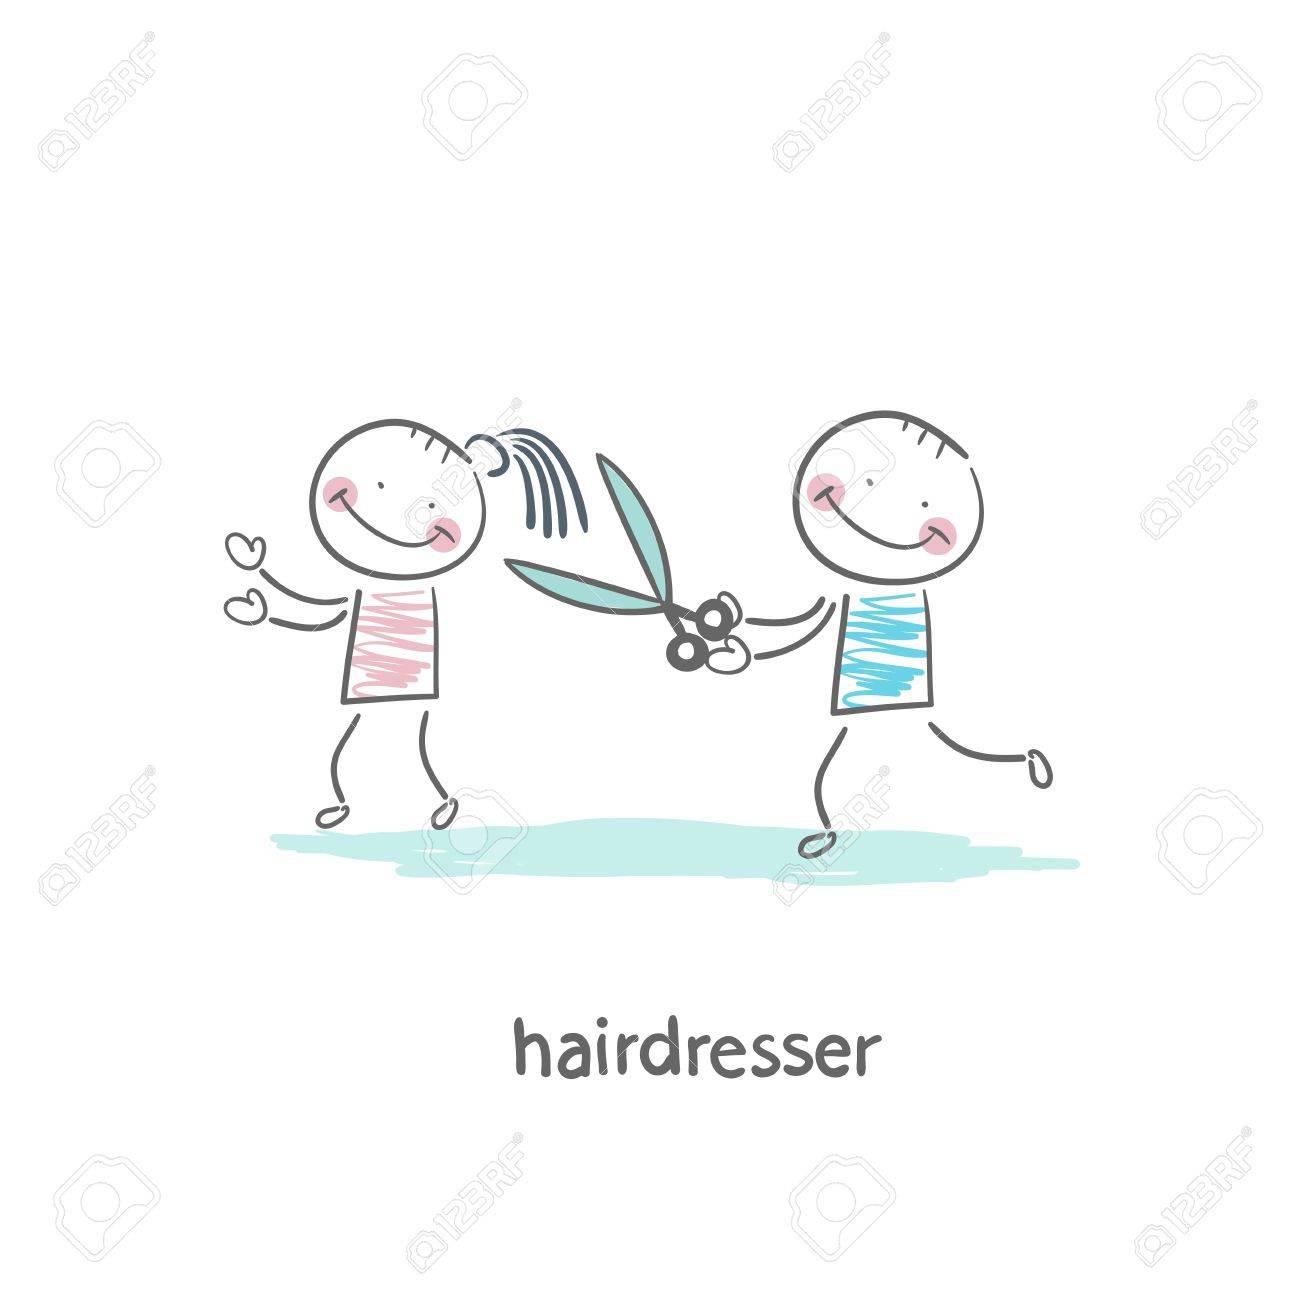 barber Stock Vector - 19150829